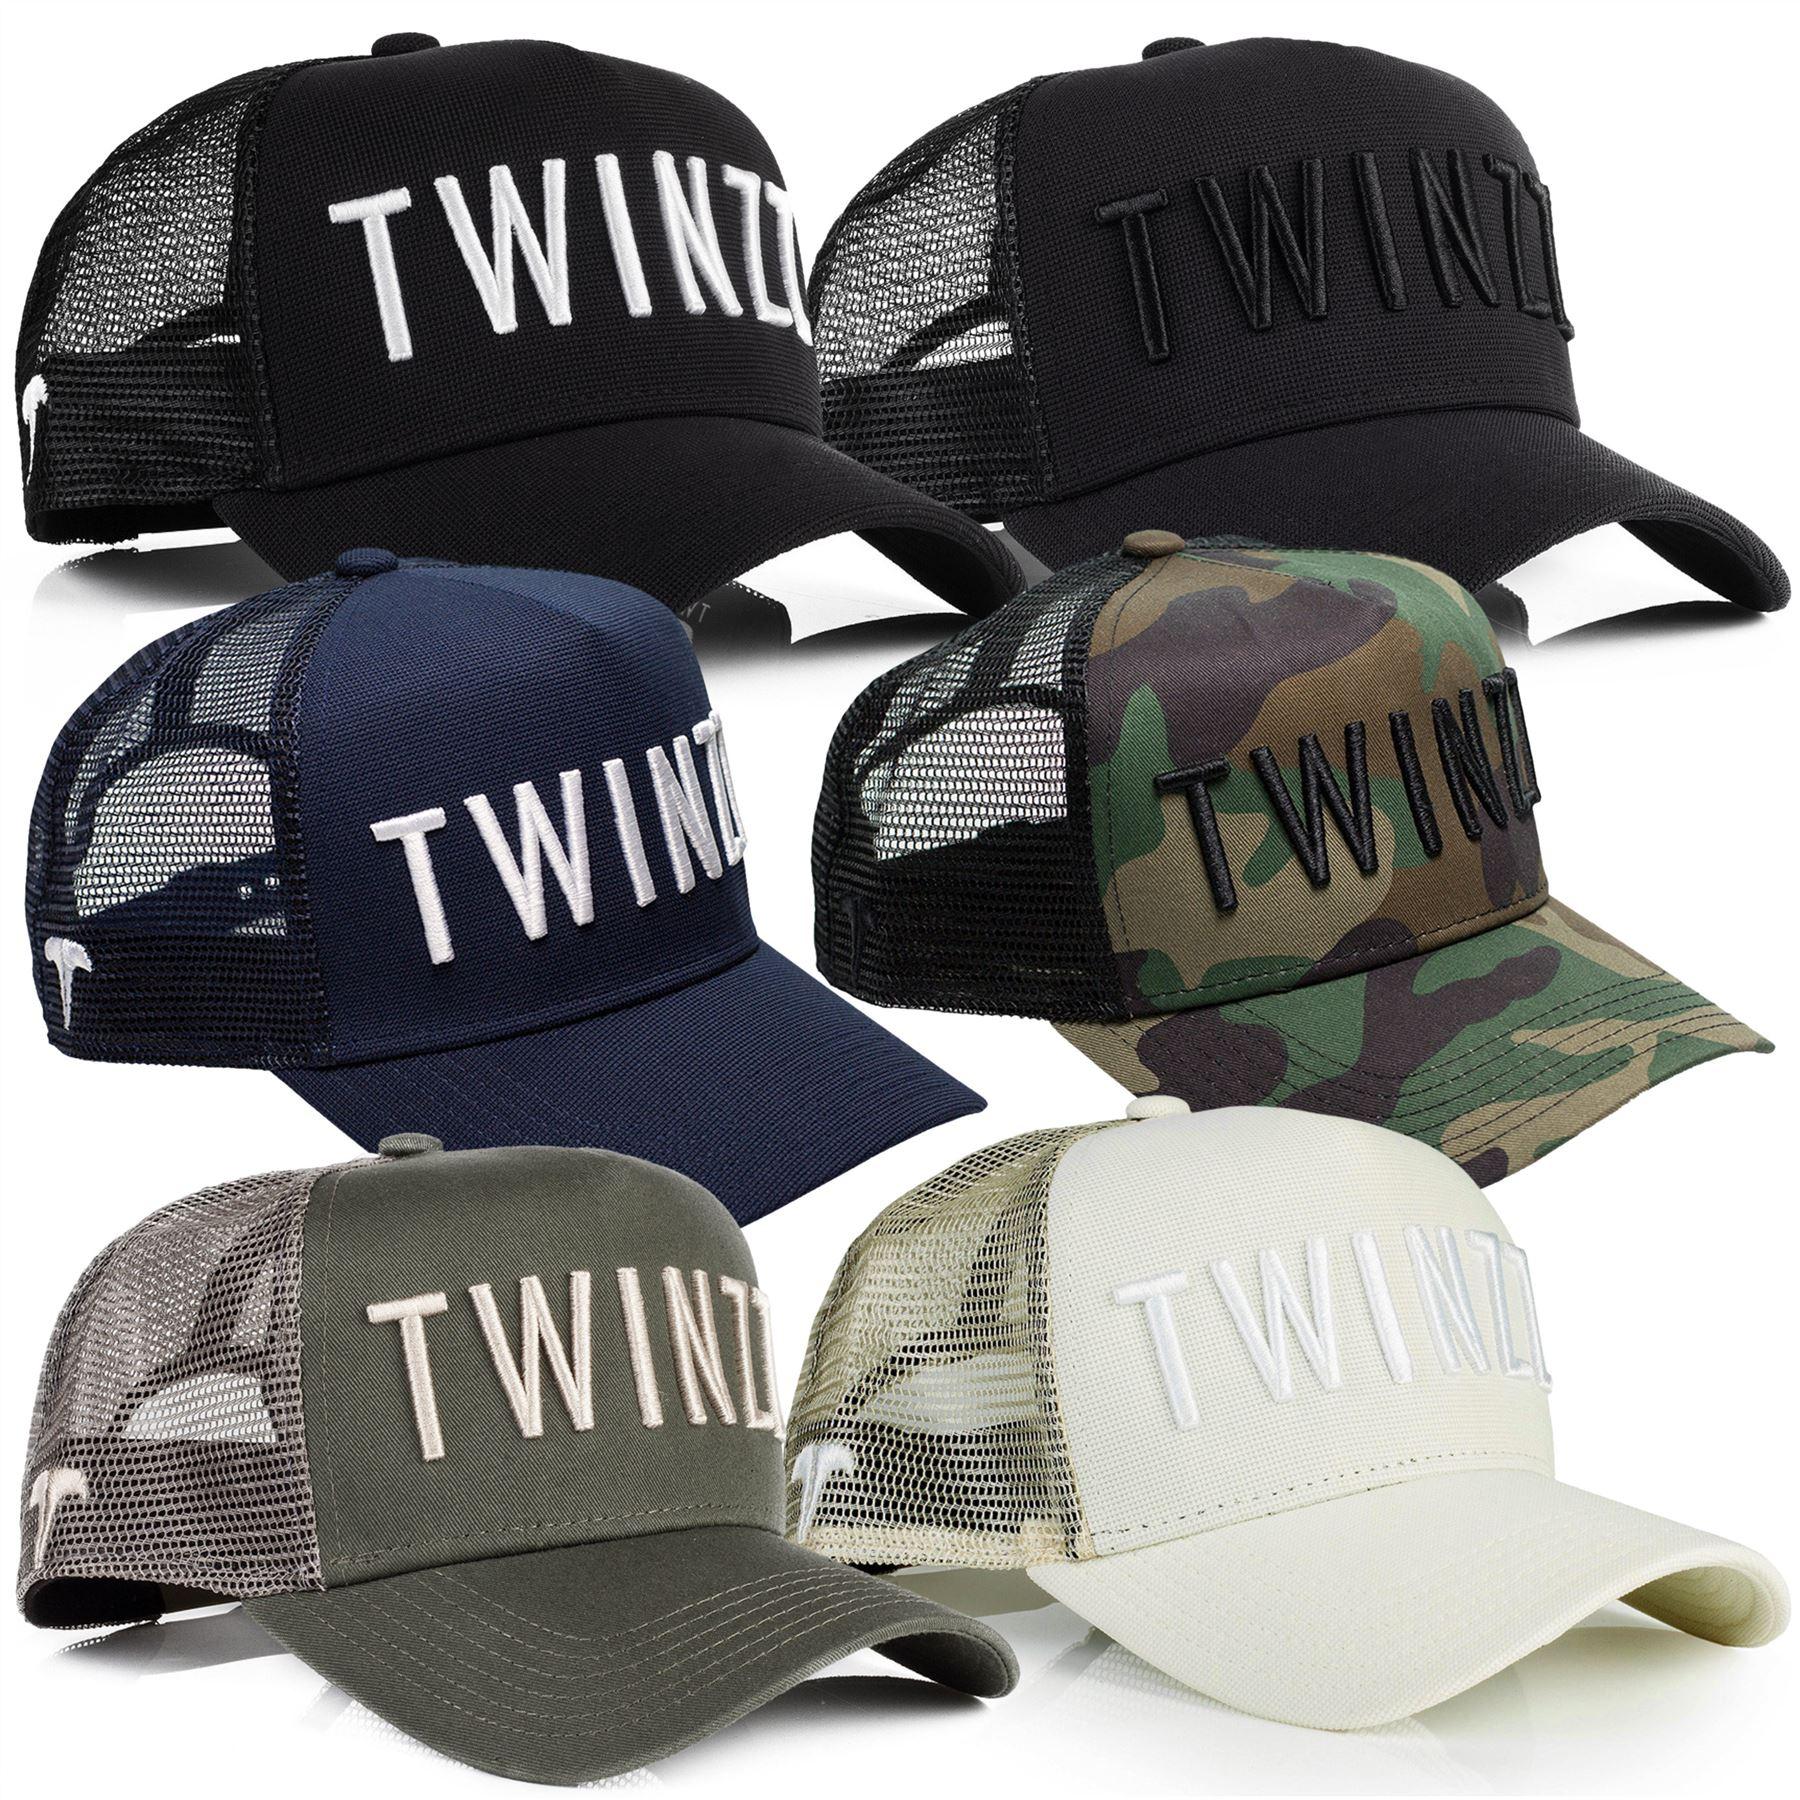 7c8d4c6f37e Twinzz 3D Mesh Trucker Adjustable Baseball Cap - Black